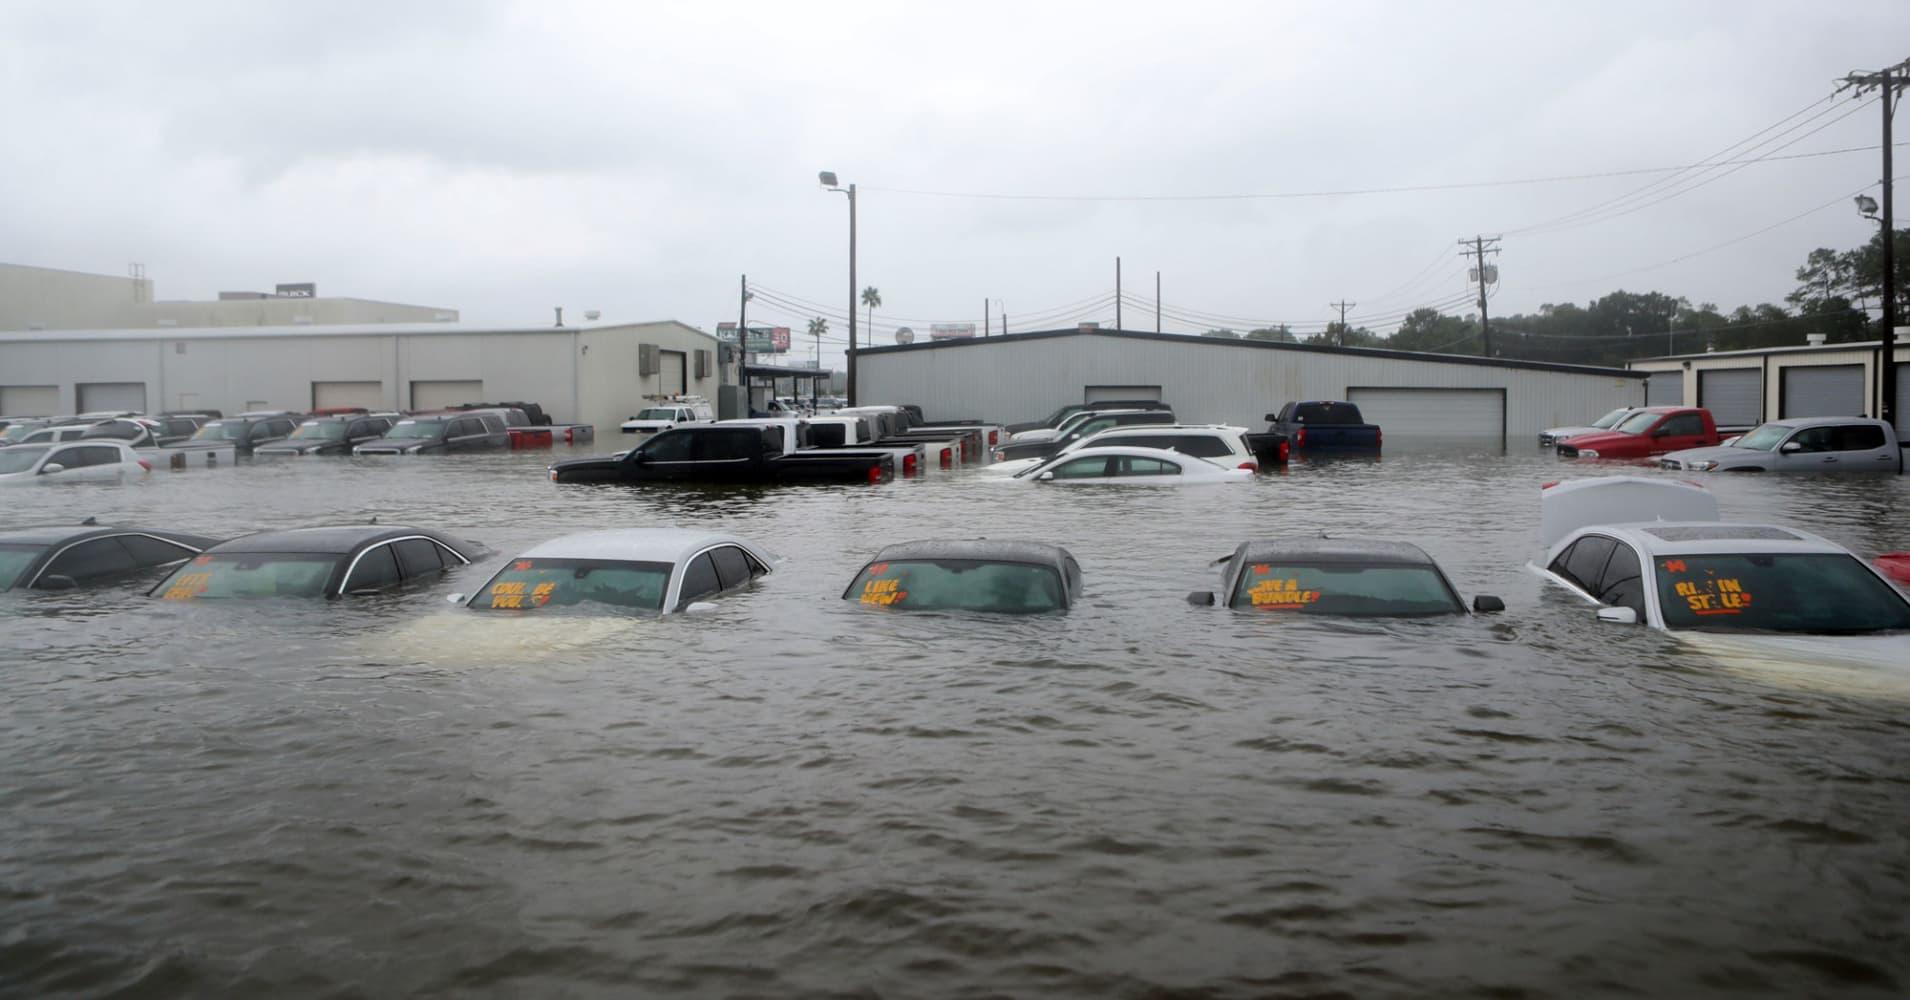 HurricaneHarveySlamsAutoIndustry